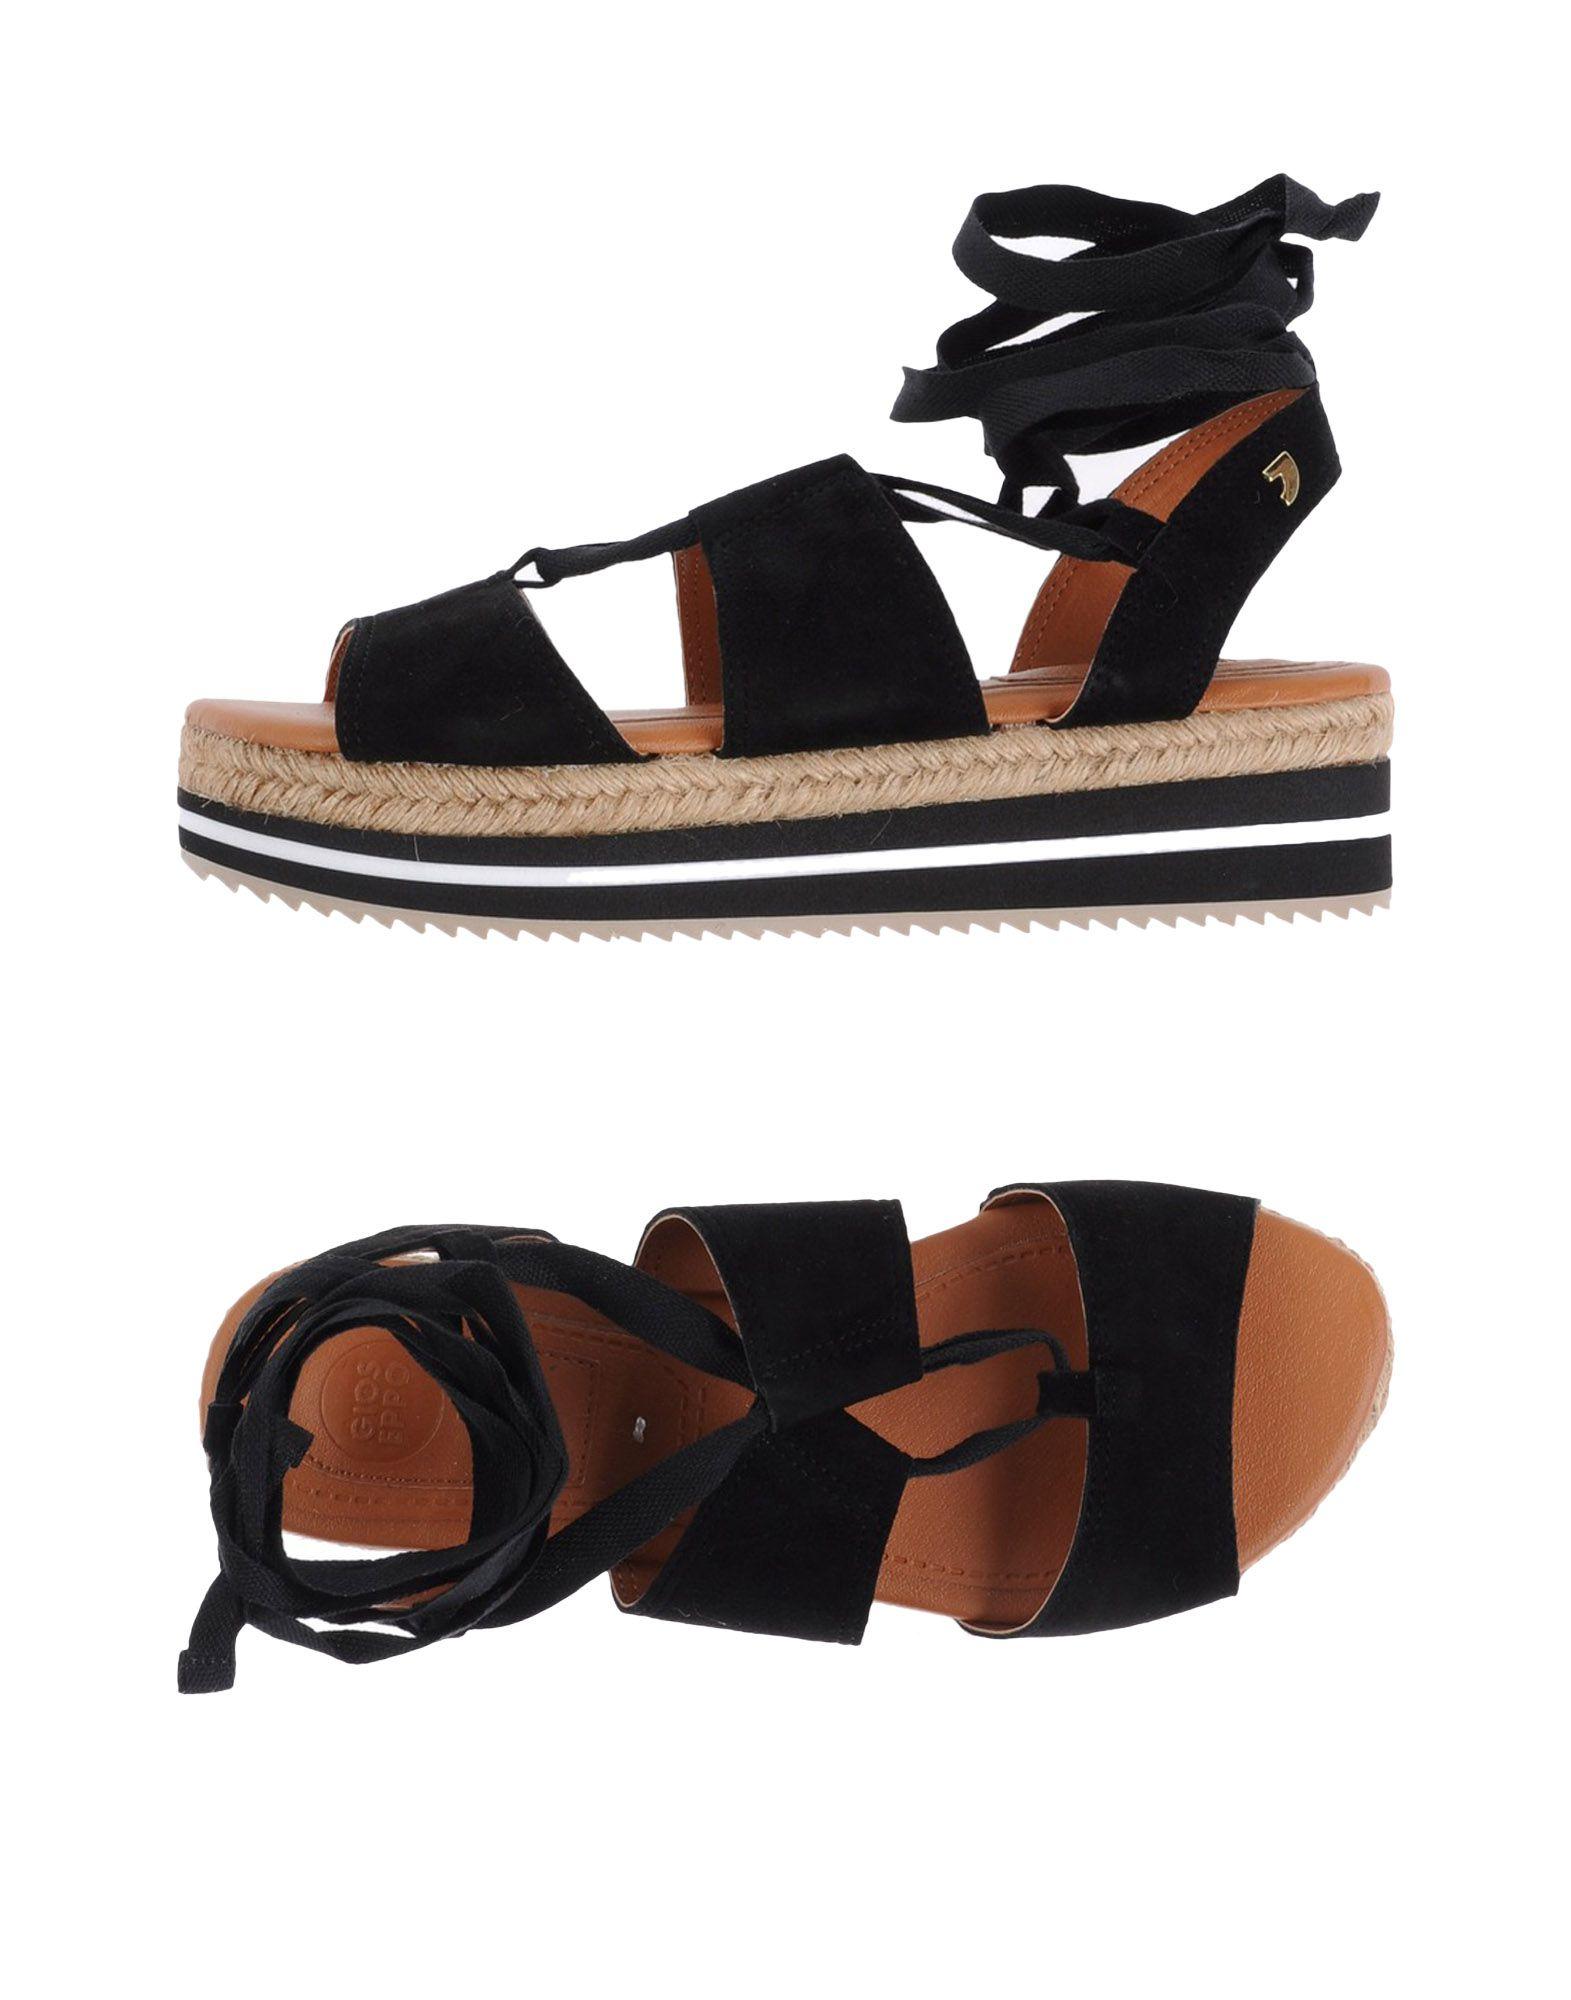 Moda Sandali Sandali Moda Gioseppo Donna - 11336521IT 0afcef